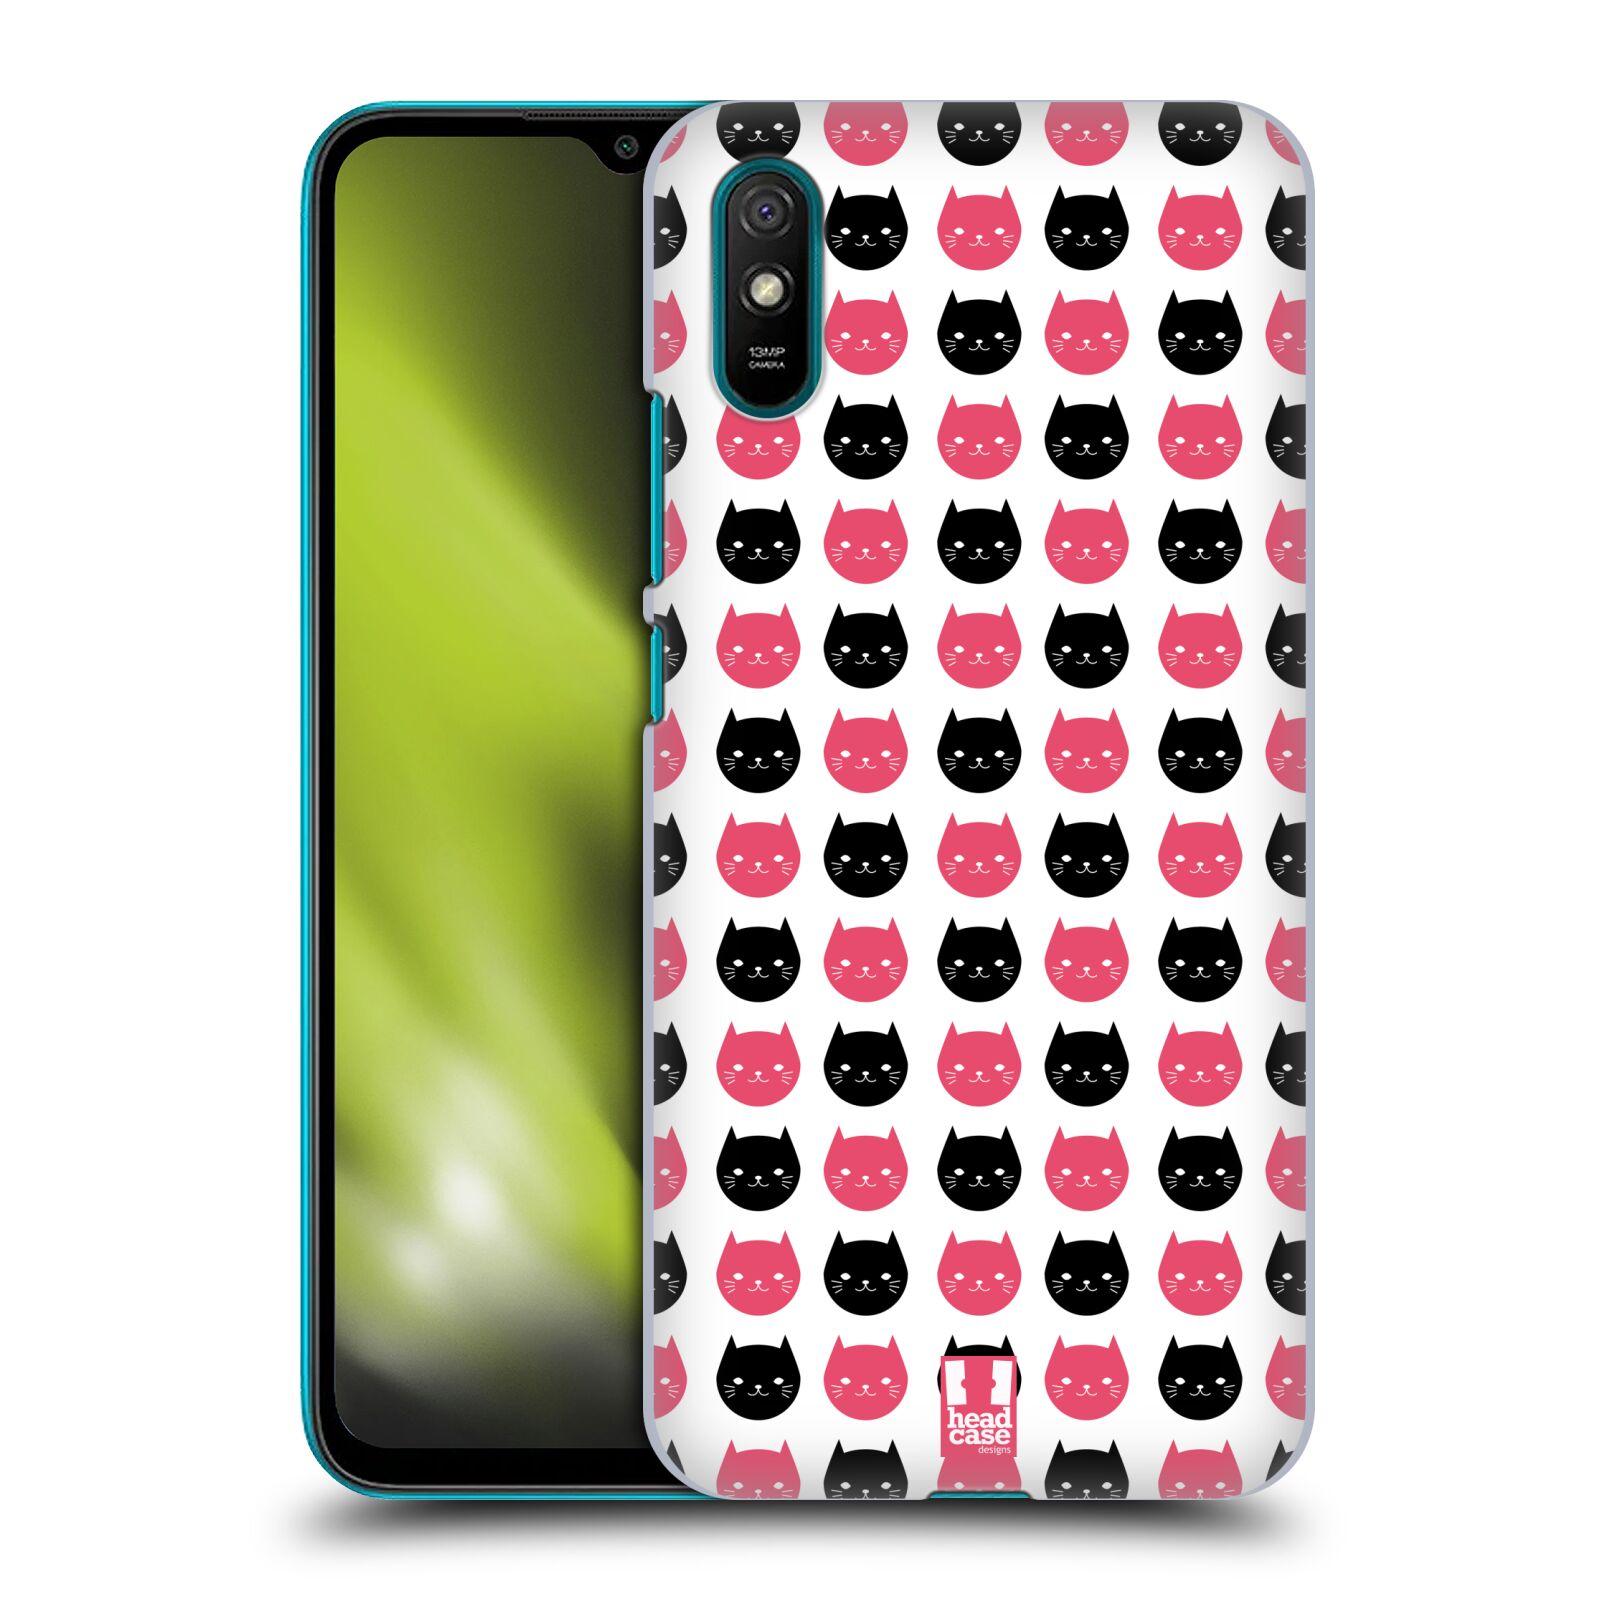 Plastové pouzdro na mobil Xiaomi Redmi 9A / Xiaomi Redmi 9AT - Head Case - KOČKY Black and Pink